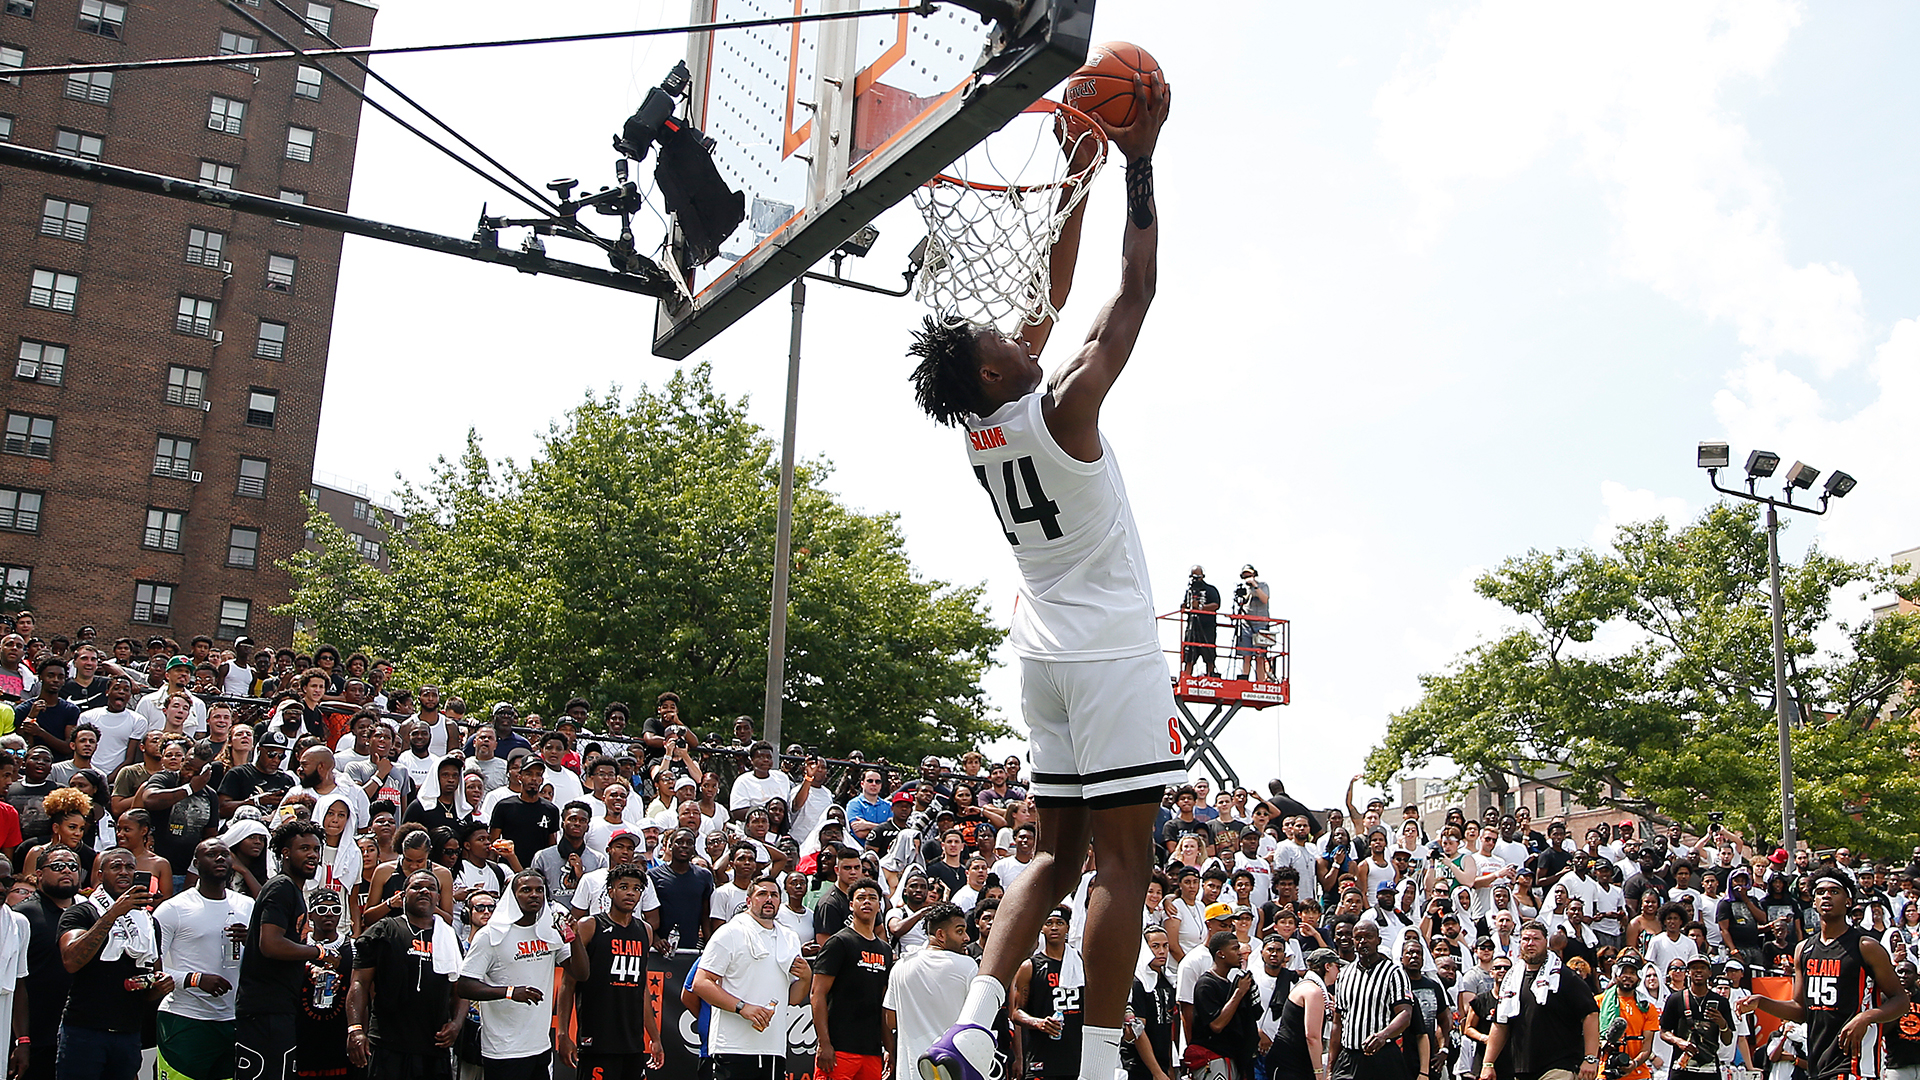 Jonathan Kuminga joining 2021 NBA Draft course is terrific for Warriors